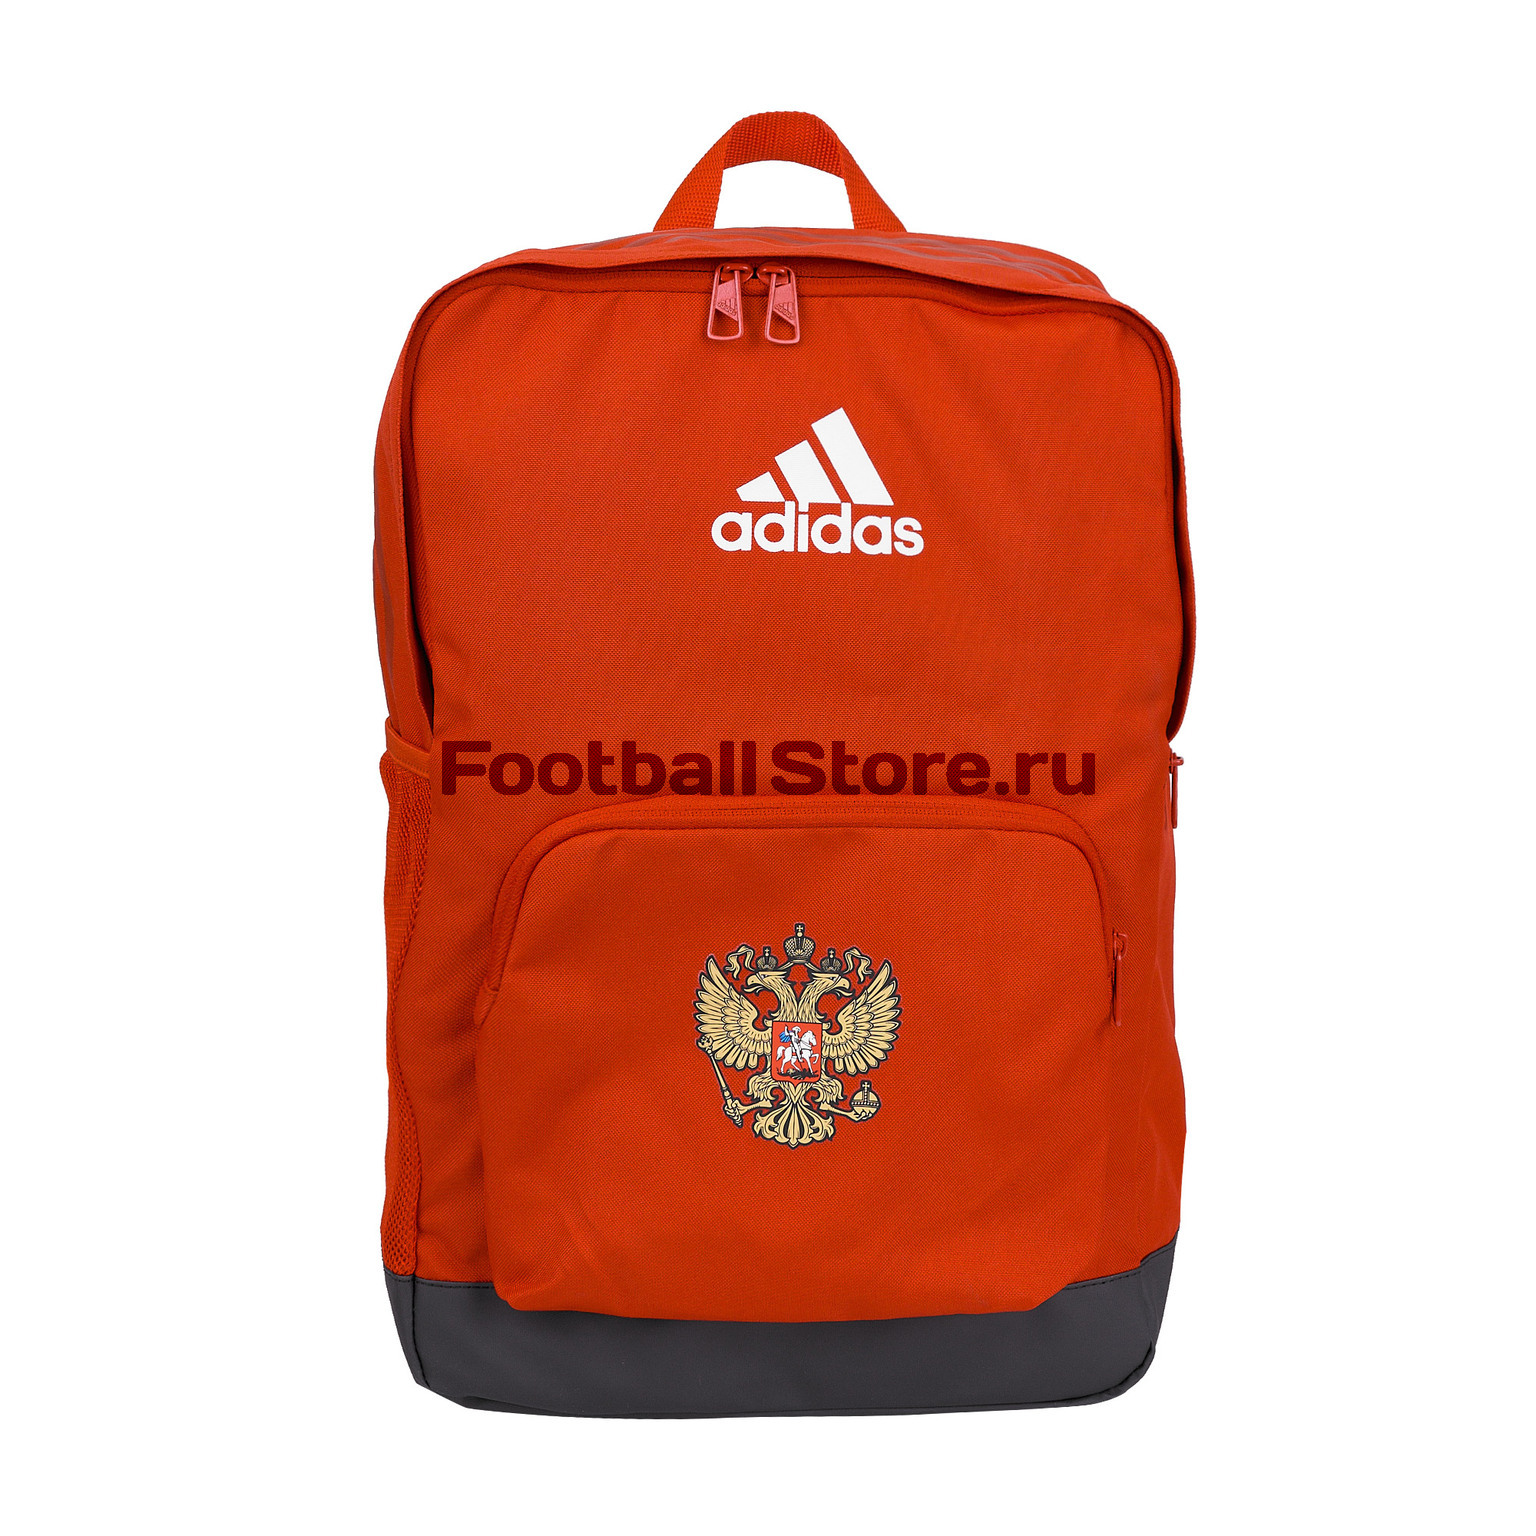 Рюкзак Adidas Russia Tiro BP BS4761-1 рюкзак adidas clas bp 3s